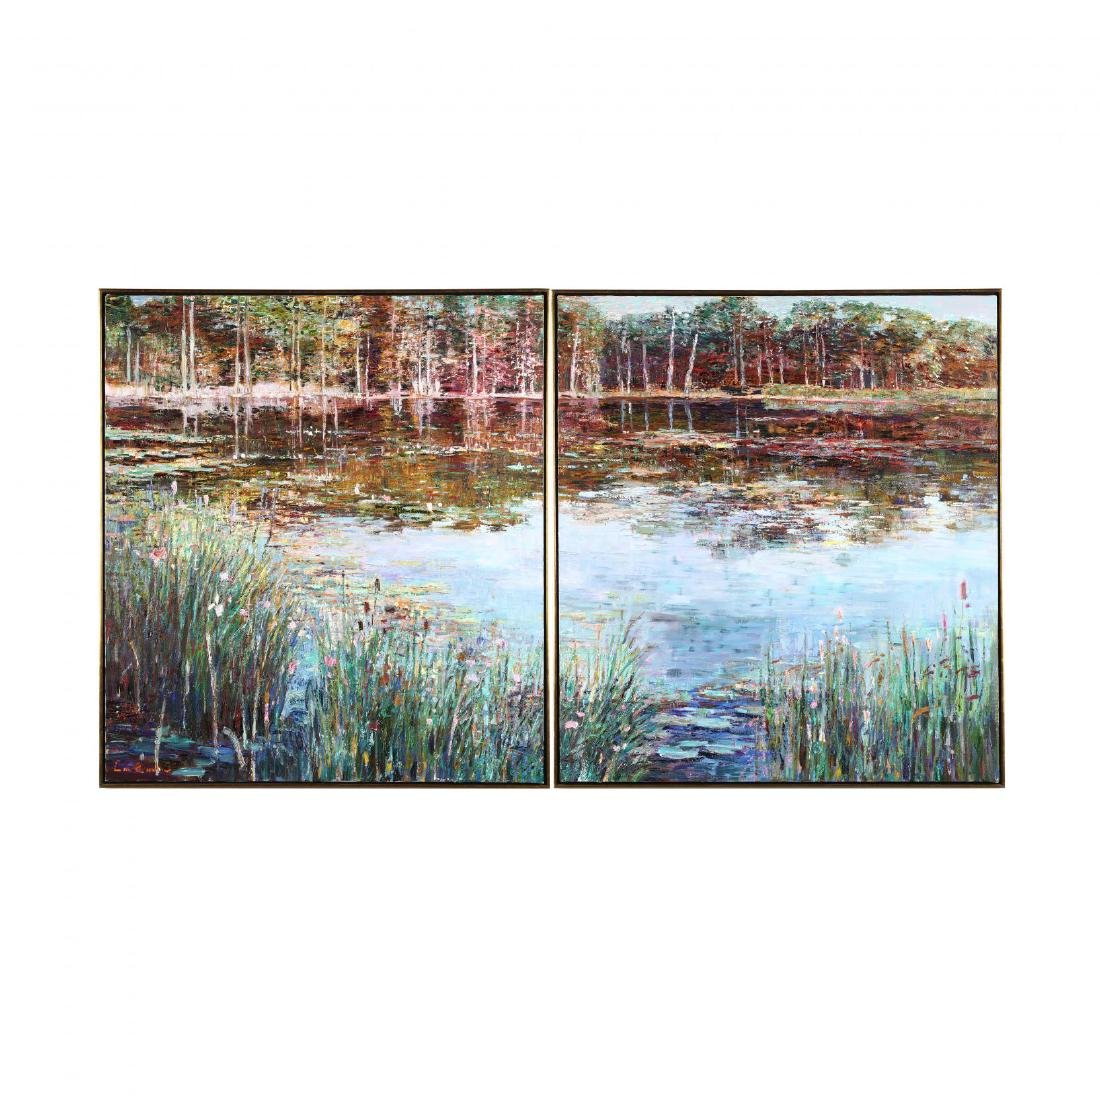 Lau Chun (Chinese/American, b. 1942), Pond's Edge -